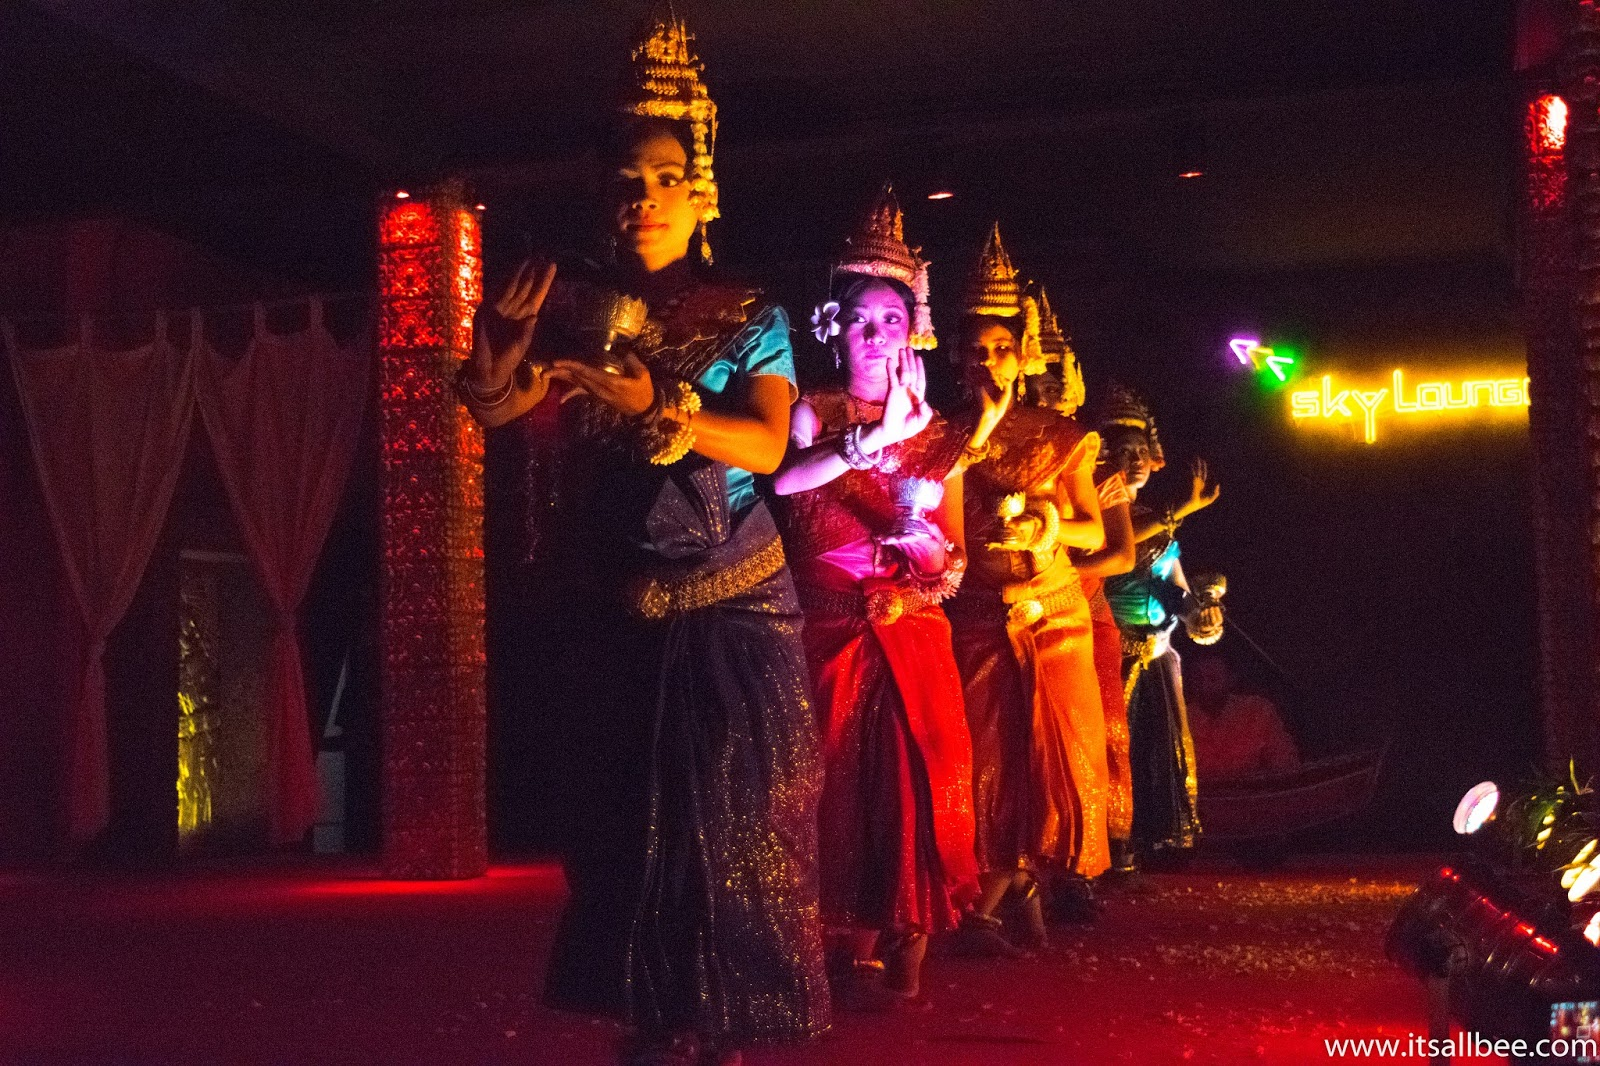 Pub Street Siem Reap | Where To Eat, Sleep, Shop In Siem Reap